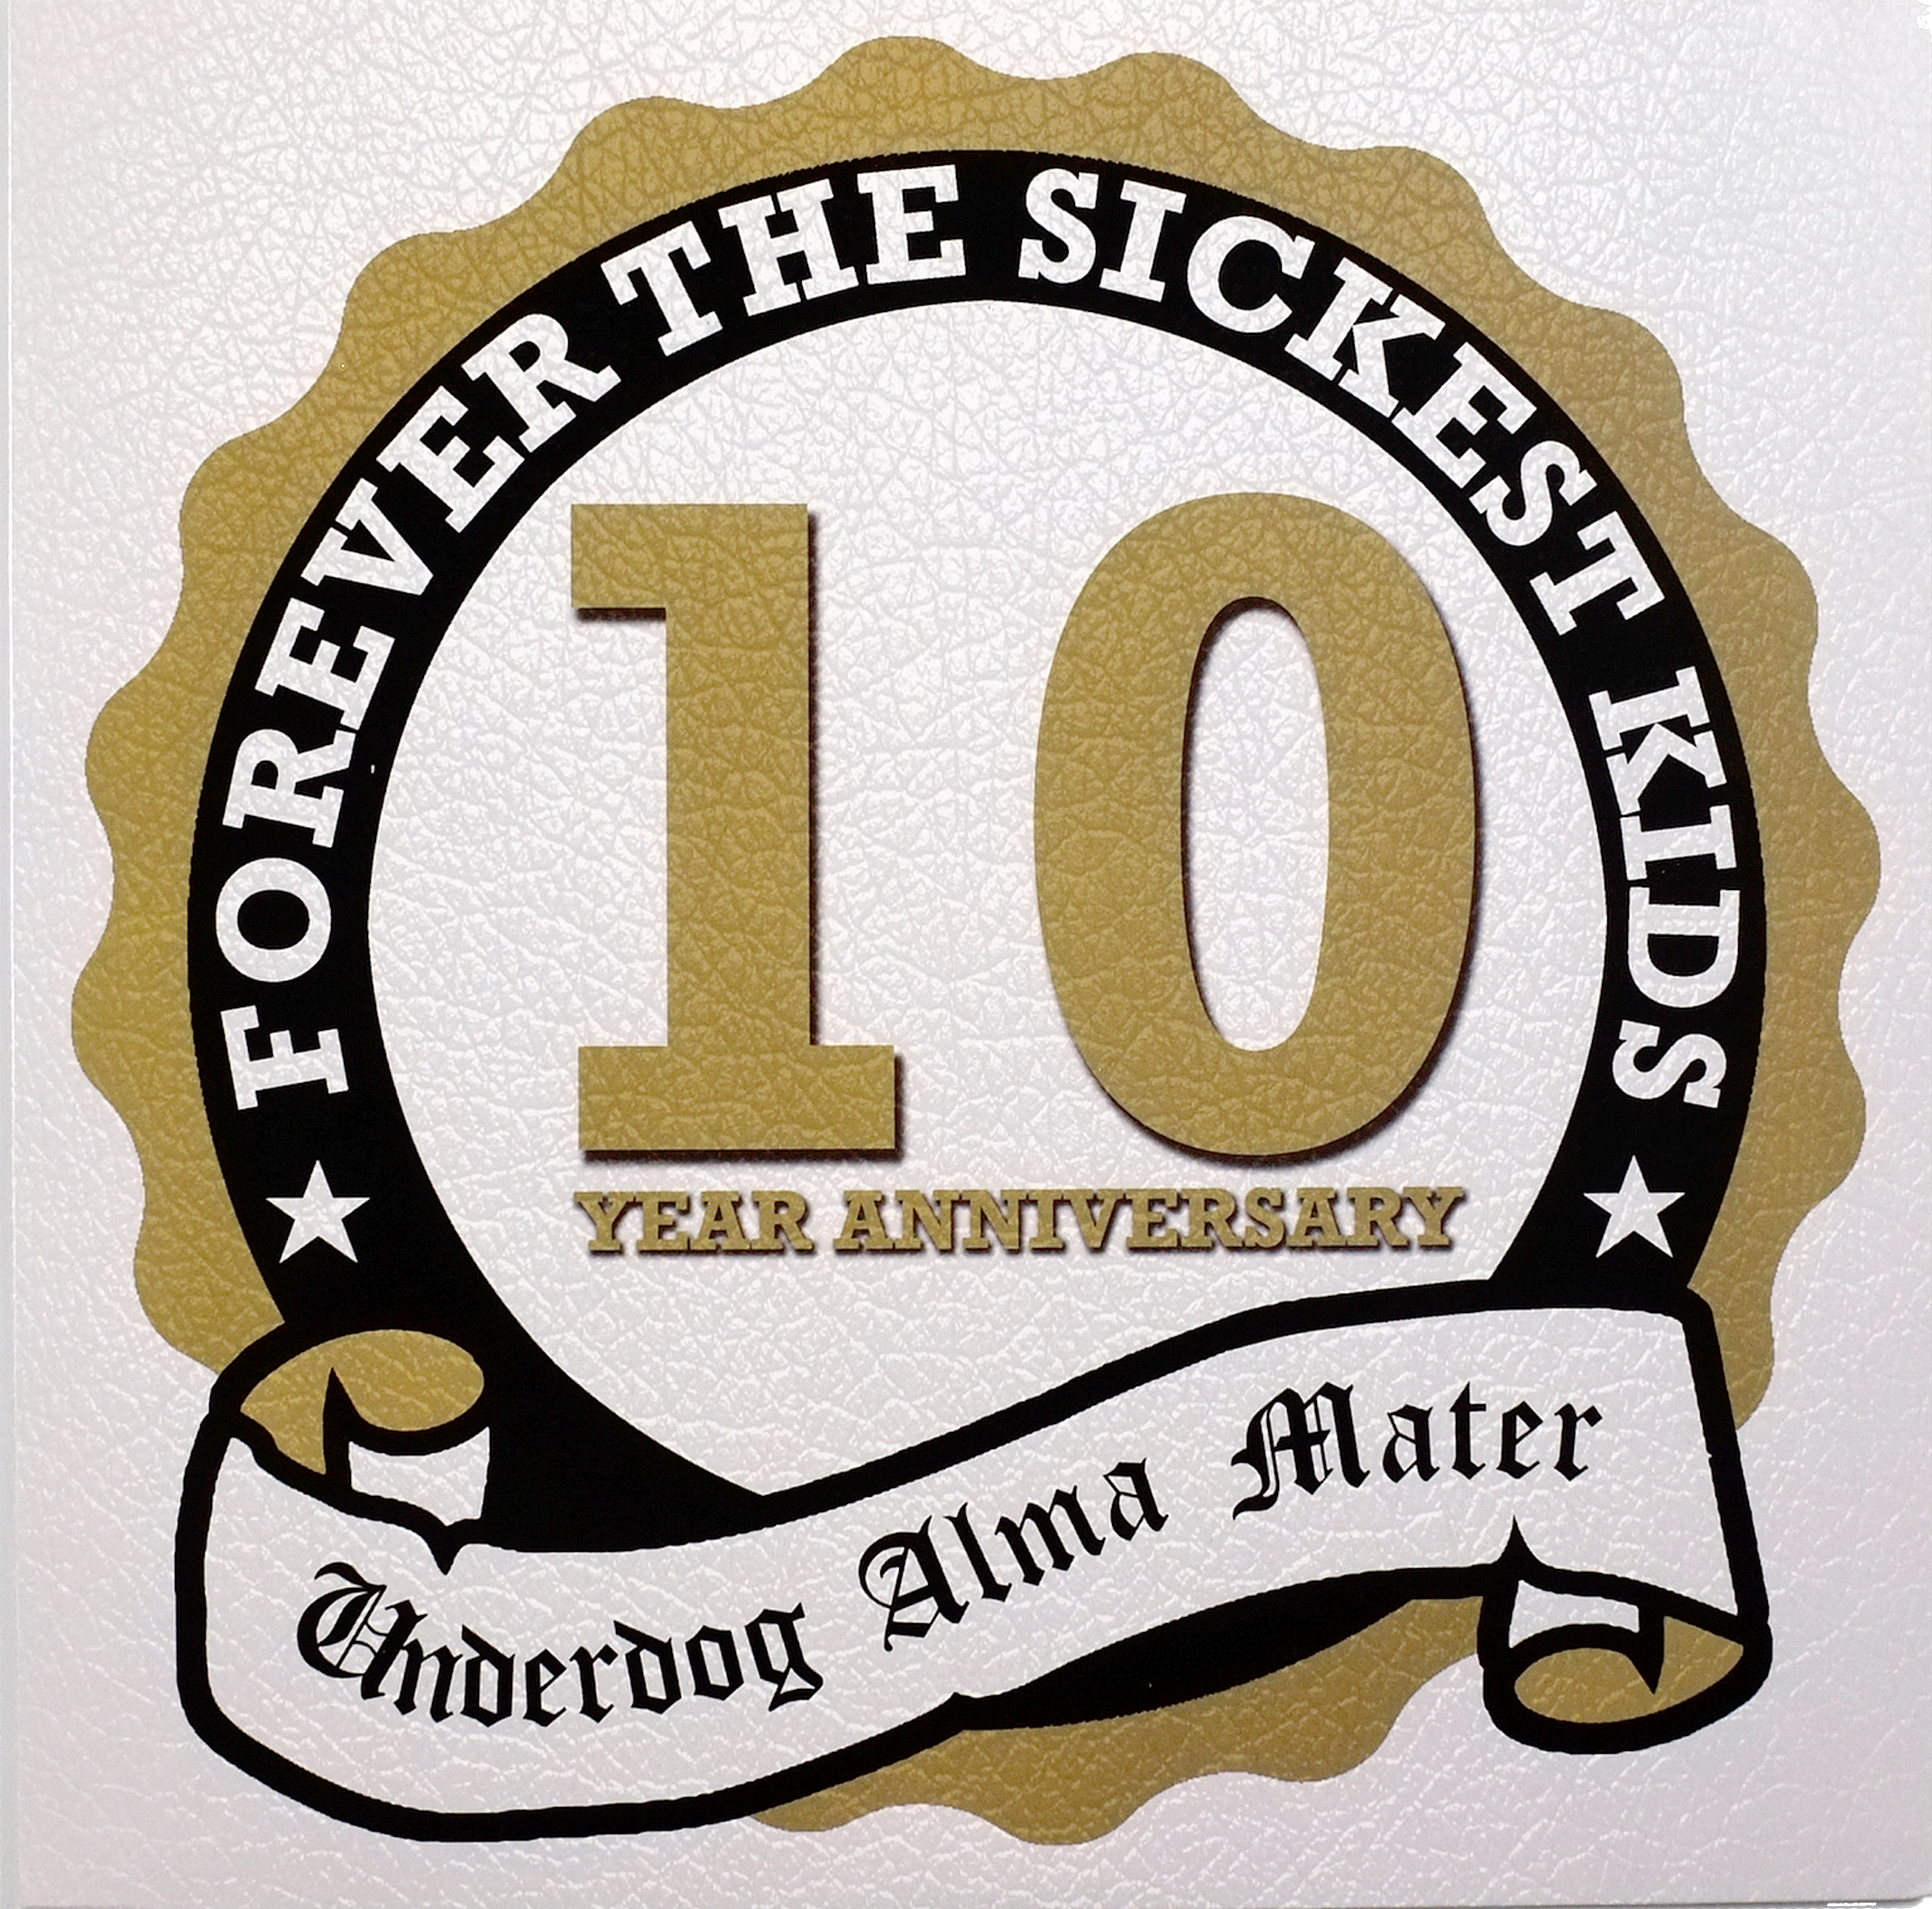 Underdog Alma Mater Vinyl - 10 Year Anniversary